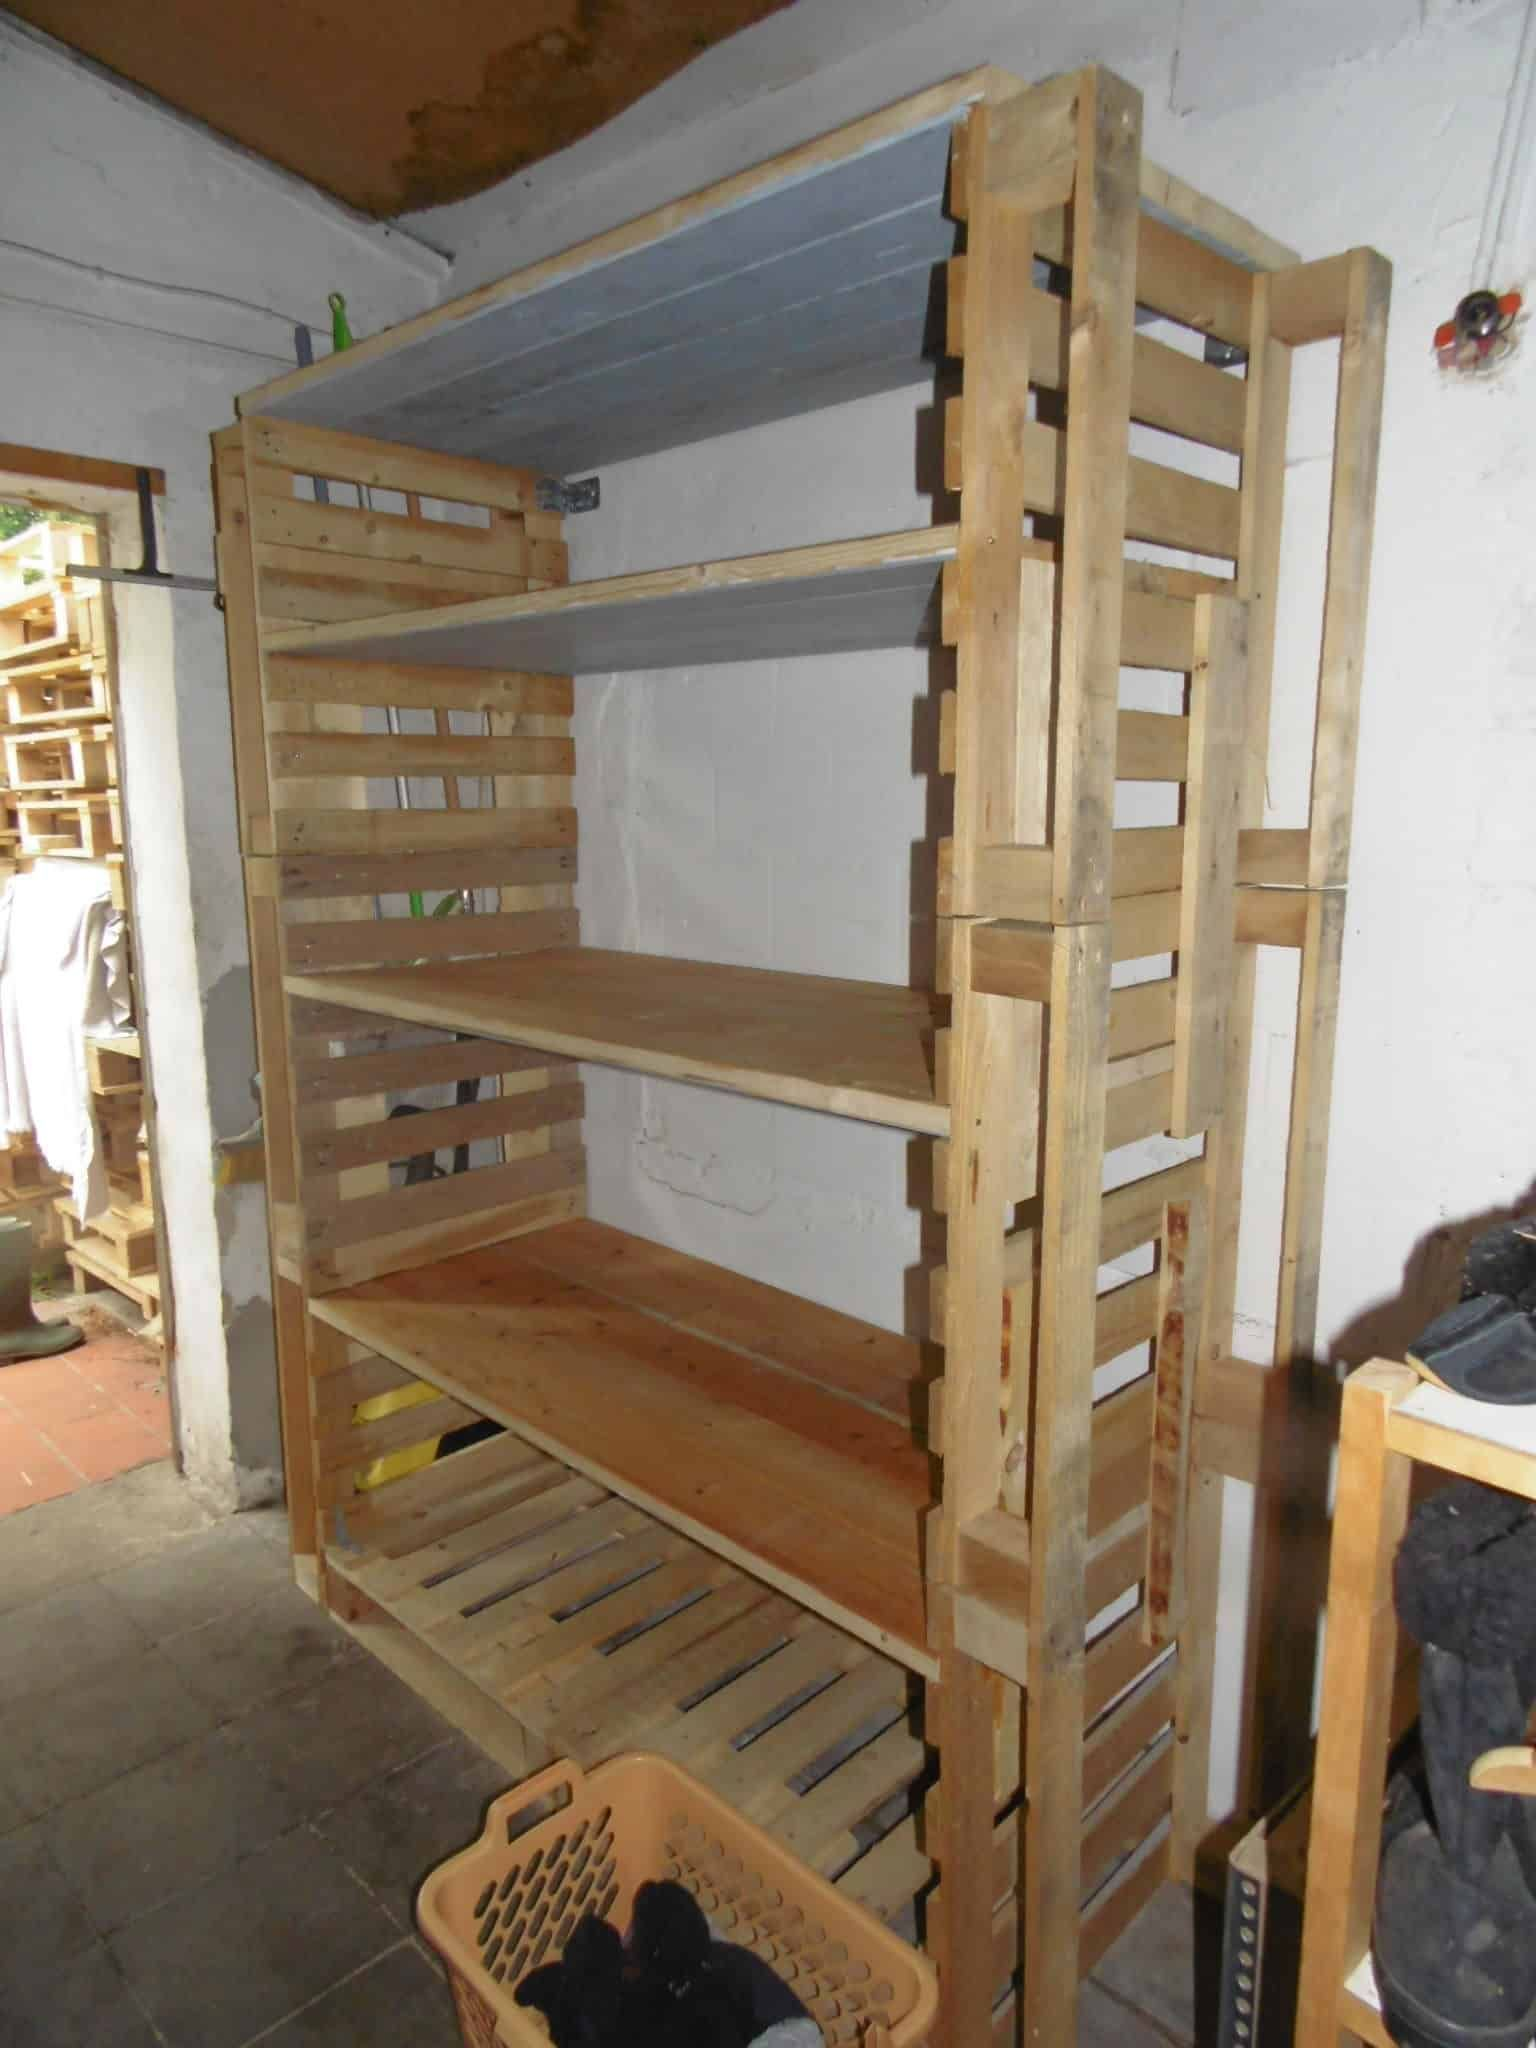 Big Pallet Organization Rack For Scrap Wood 1001 Pallets Pallet Shelves Diy Pallet Projects Pallet Diy